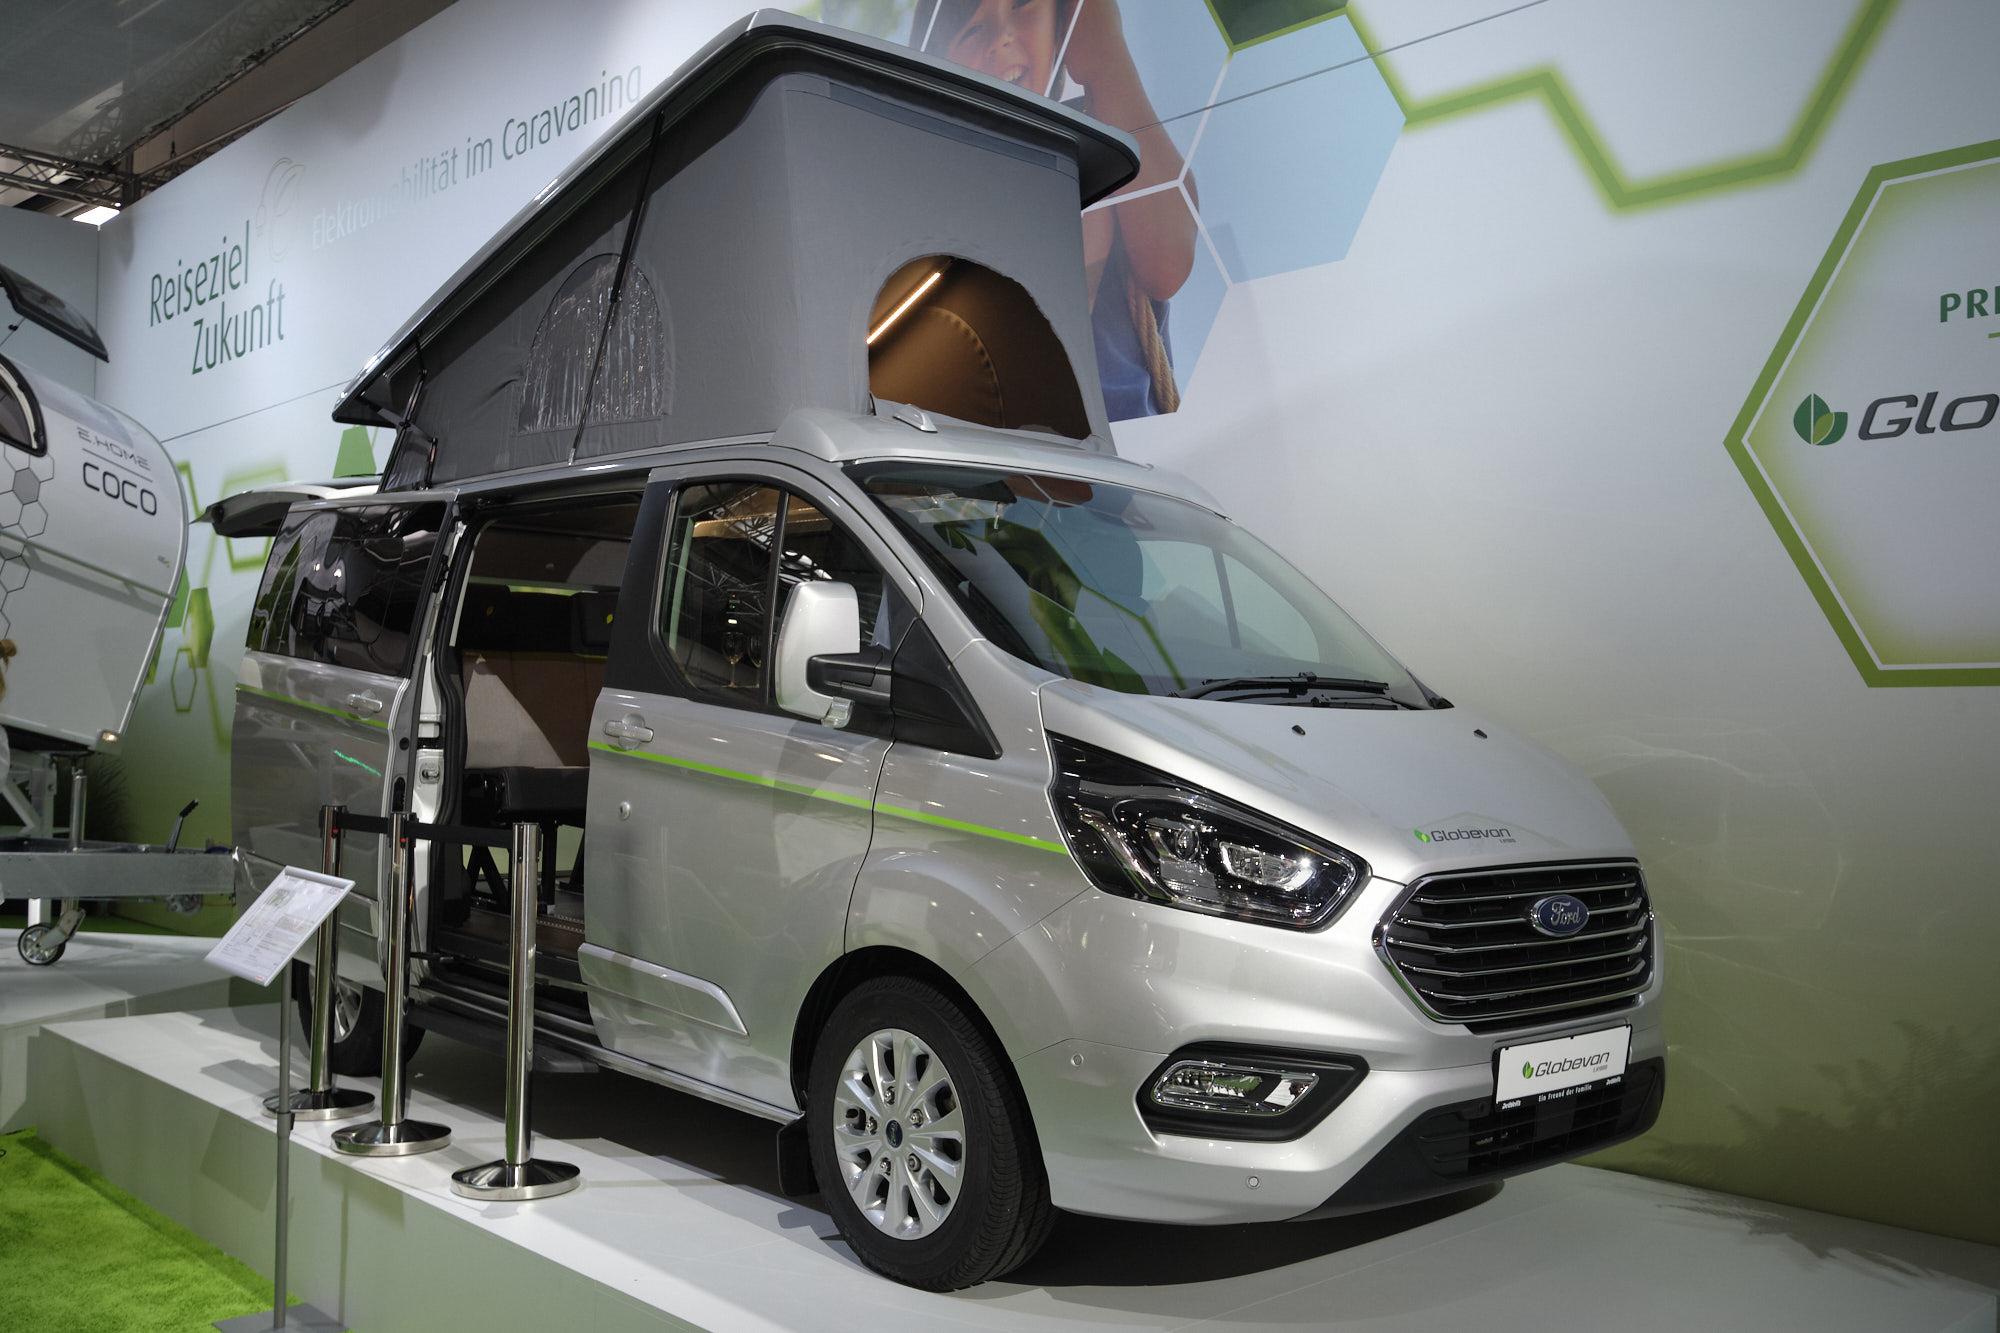 Dethleffs Globavan e.hybrid am Caravan Salon 2019